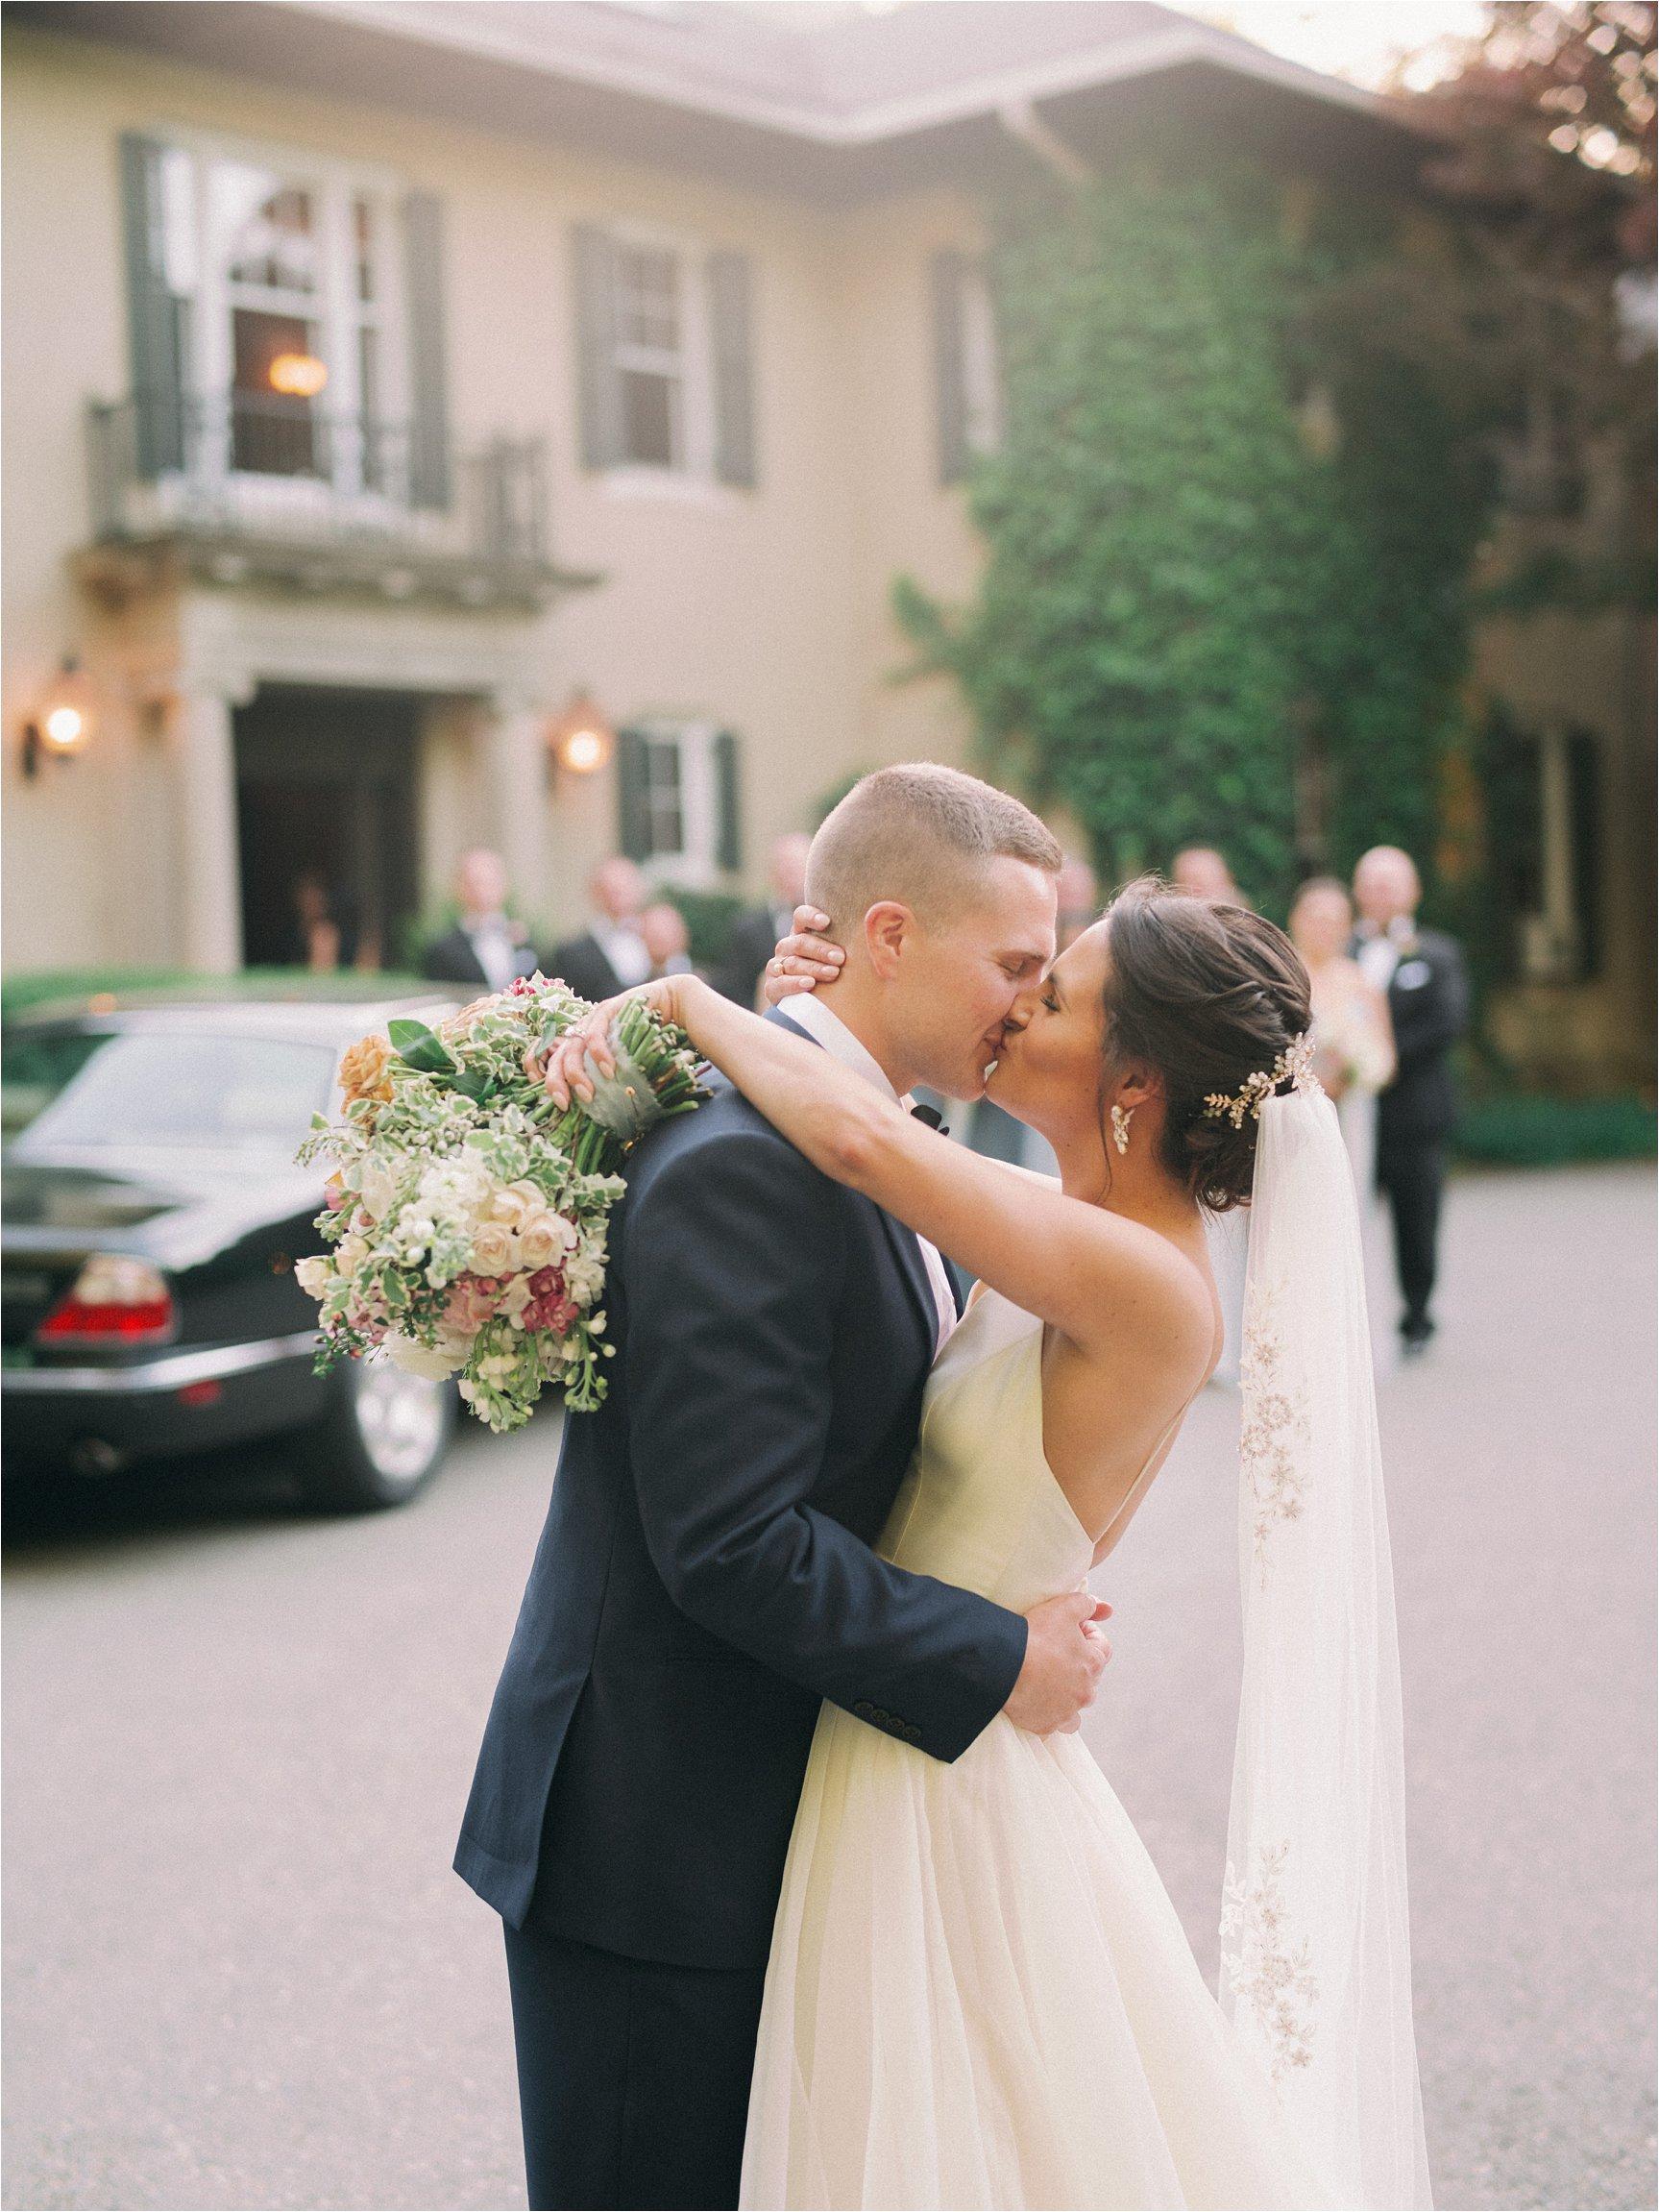 Lord_Thompson_Manor_Wedding097.JPG